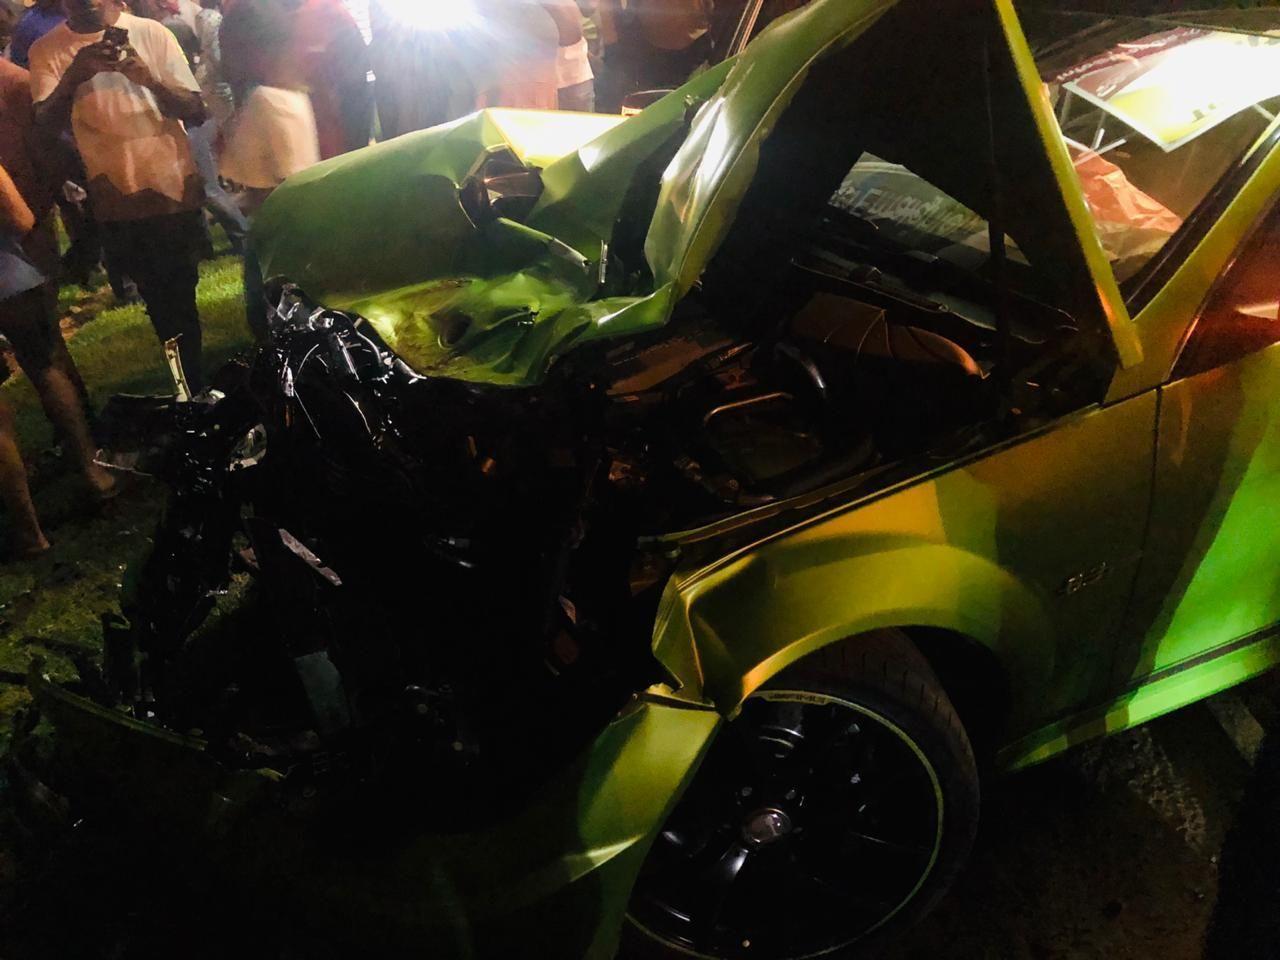 Mercedes Benz C63 Amg Legacy Edition Crashed Into A Police Car In Witbank Mercedes Benz C63 Amg Mercedes Benz C63 Police Cars